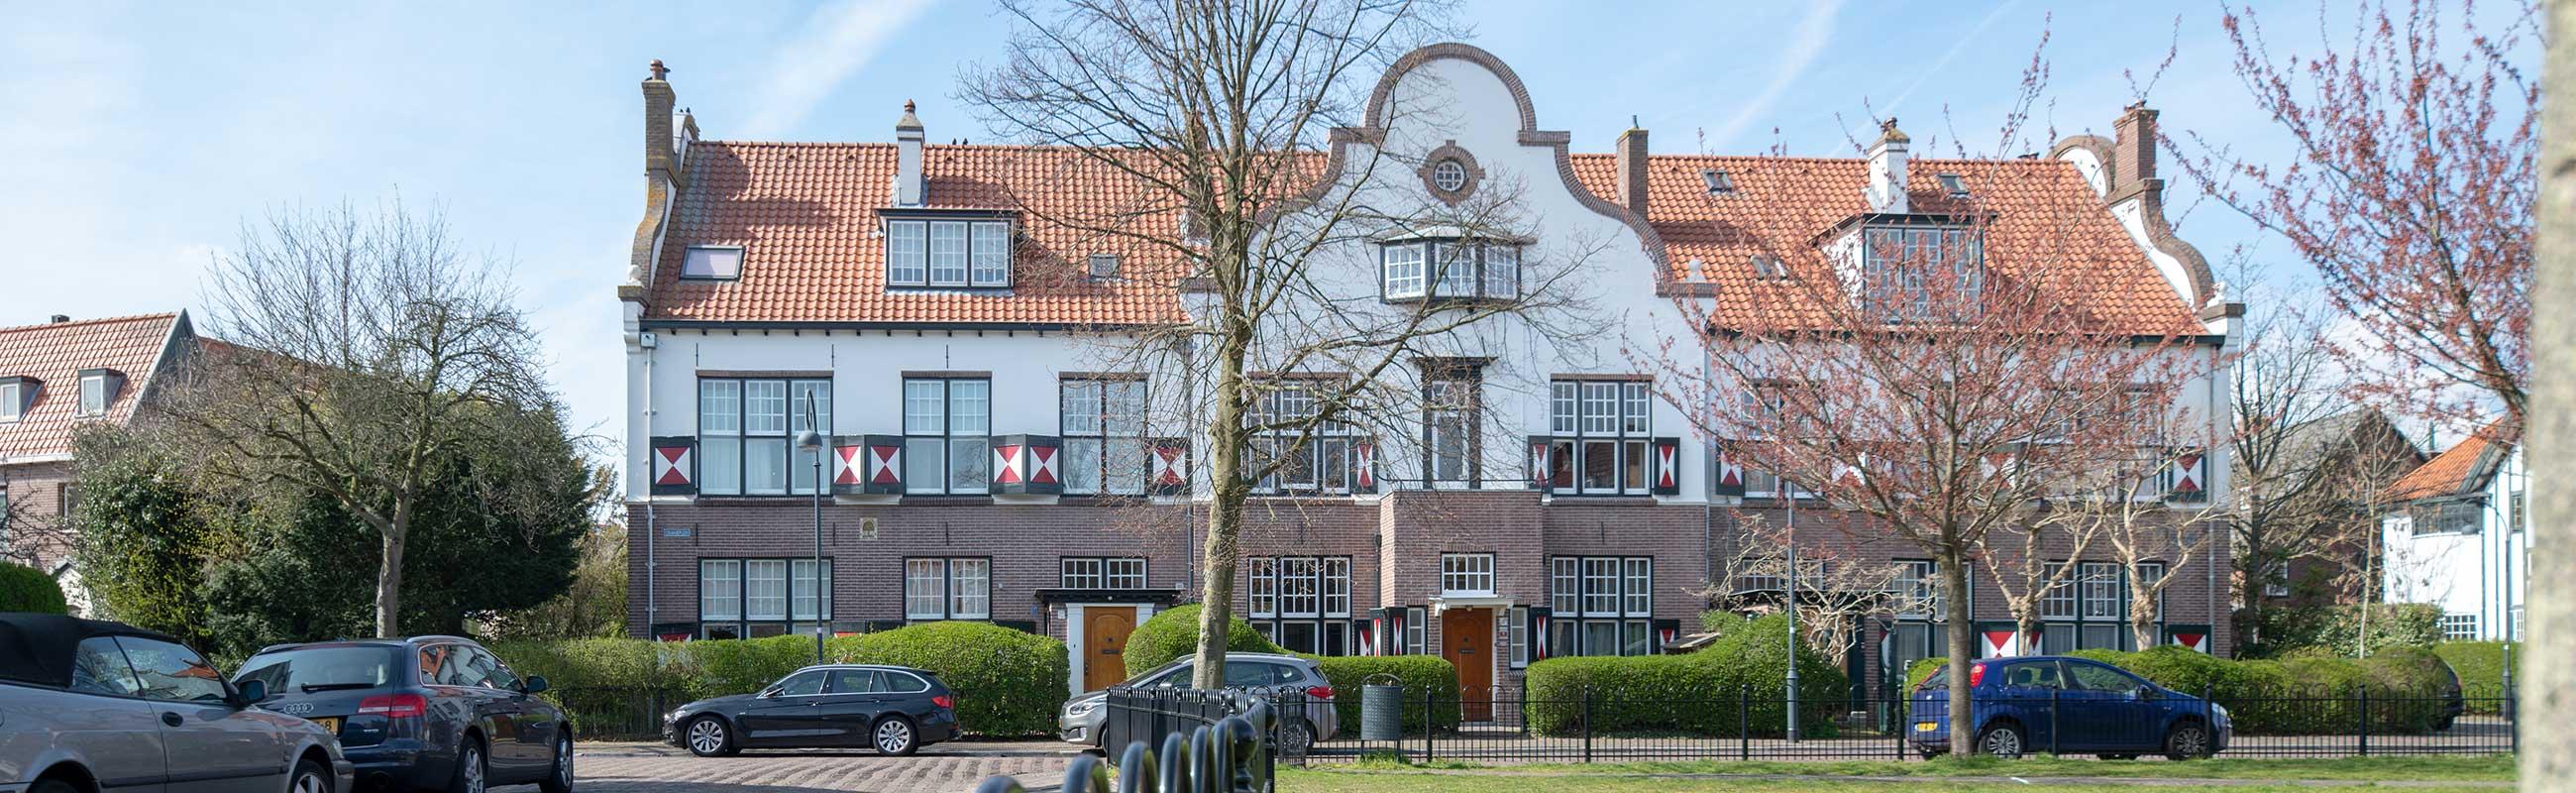 Wonen in een Haarlemse stadsvilla dat is wonen in Haarlem zuidwest.